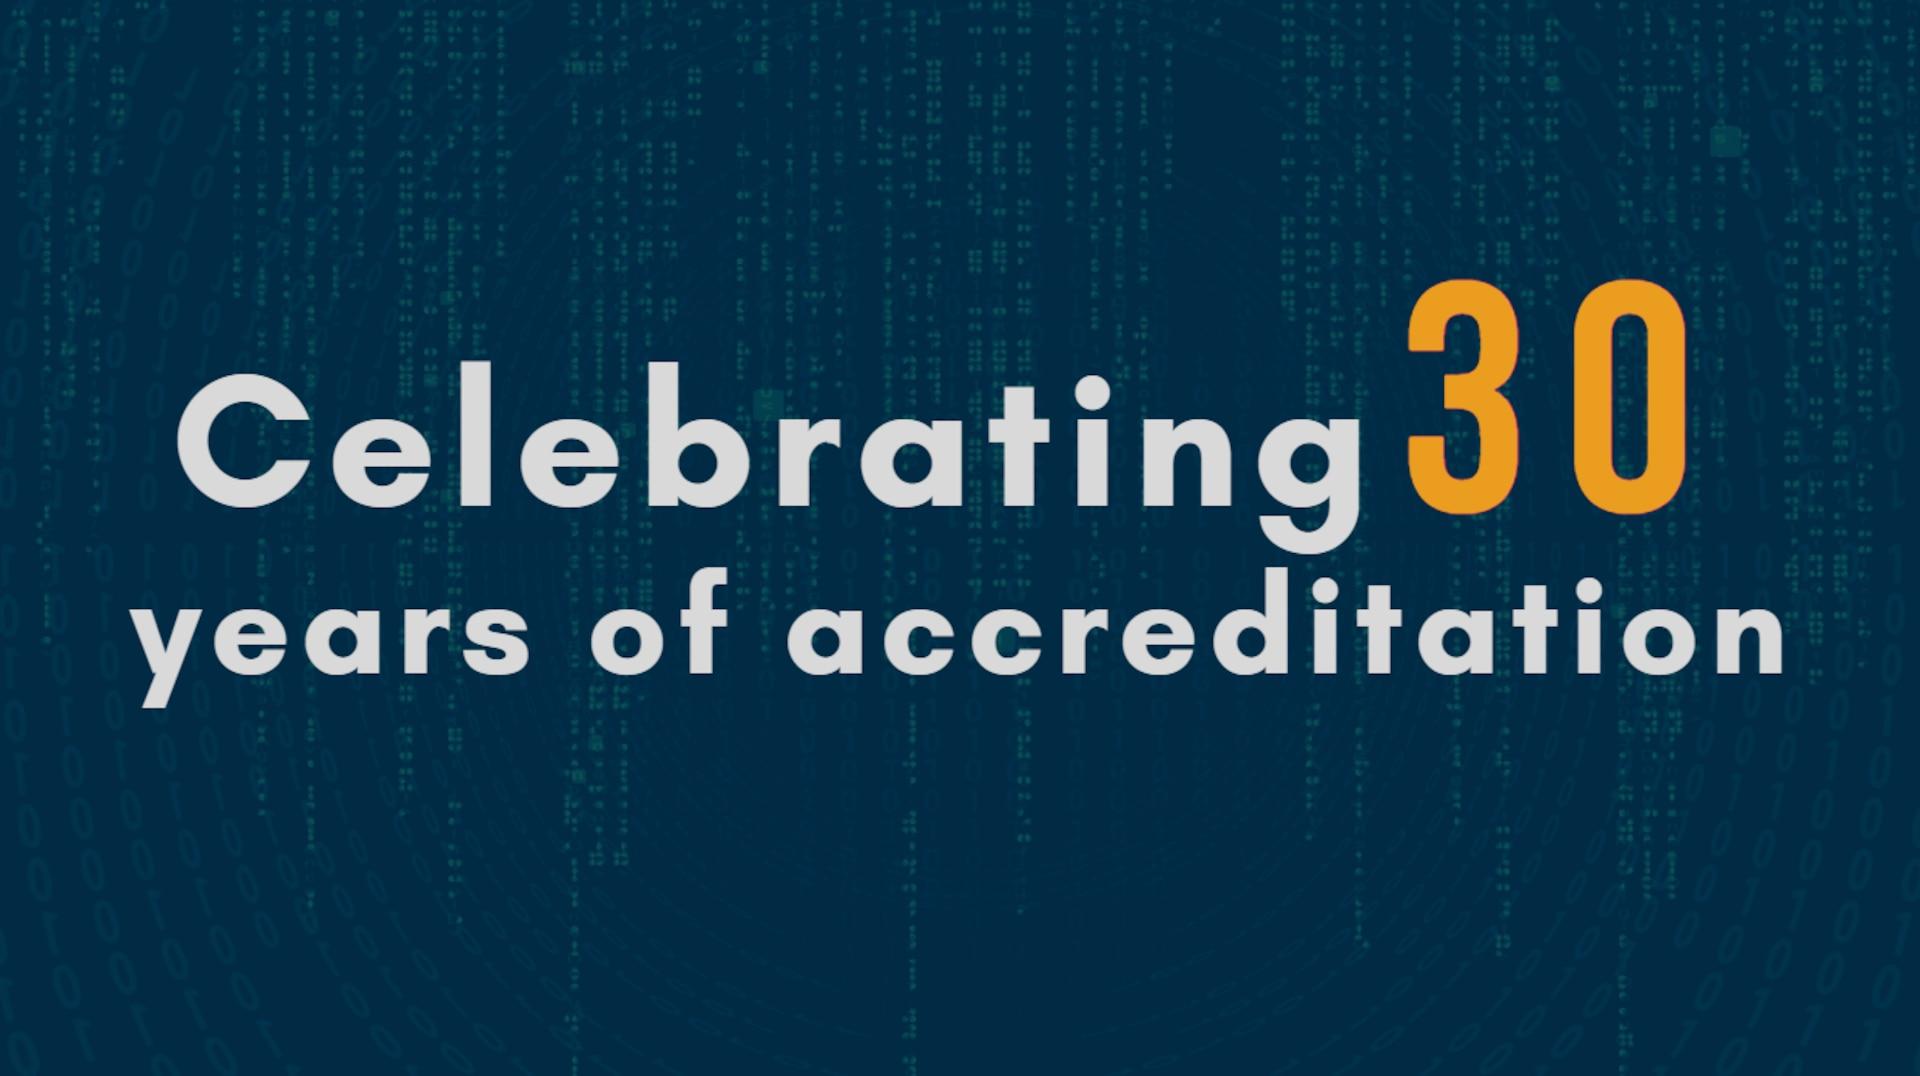 NSA's National Cryptologic School celebrates 30 years of accreditation